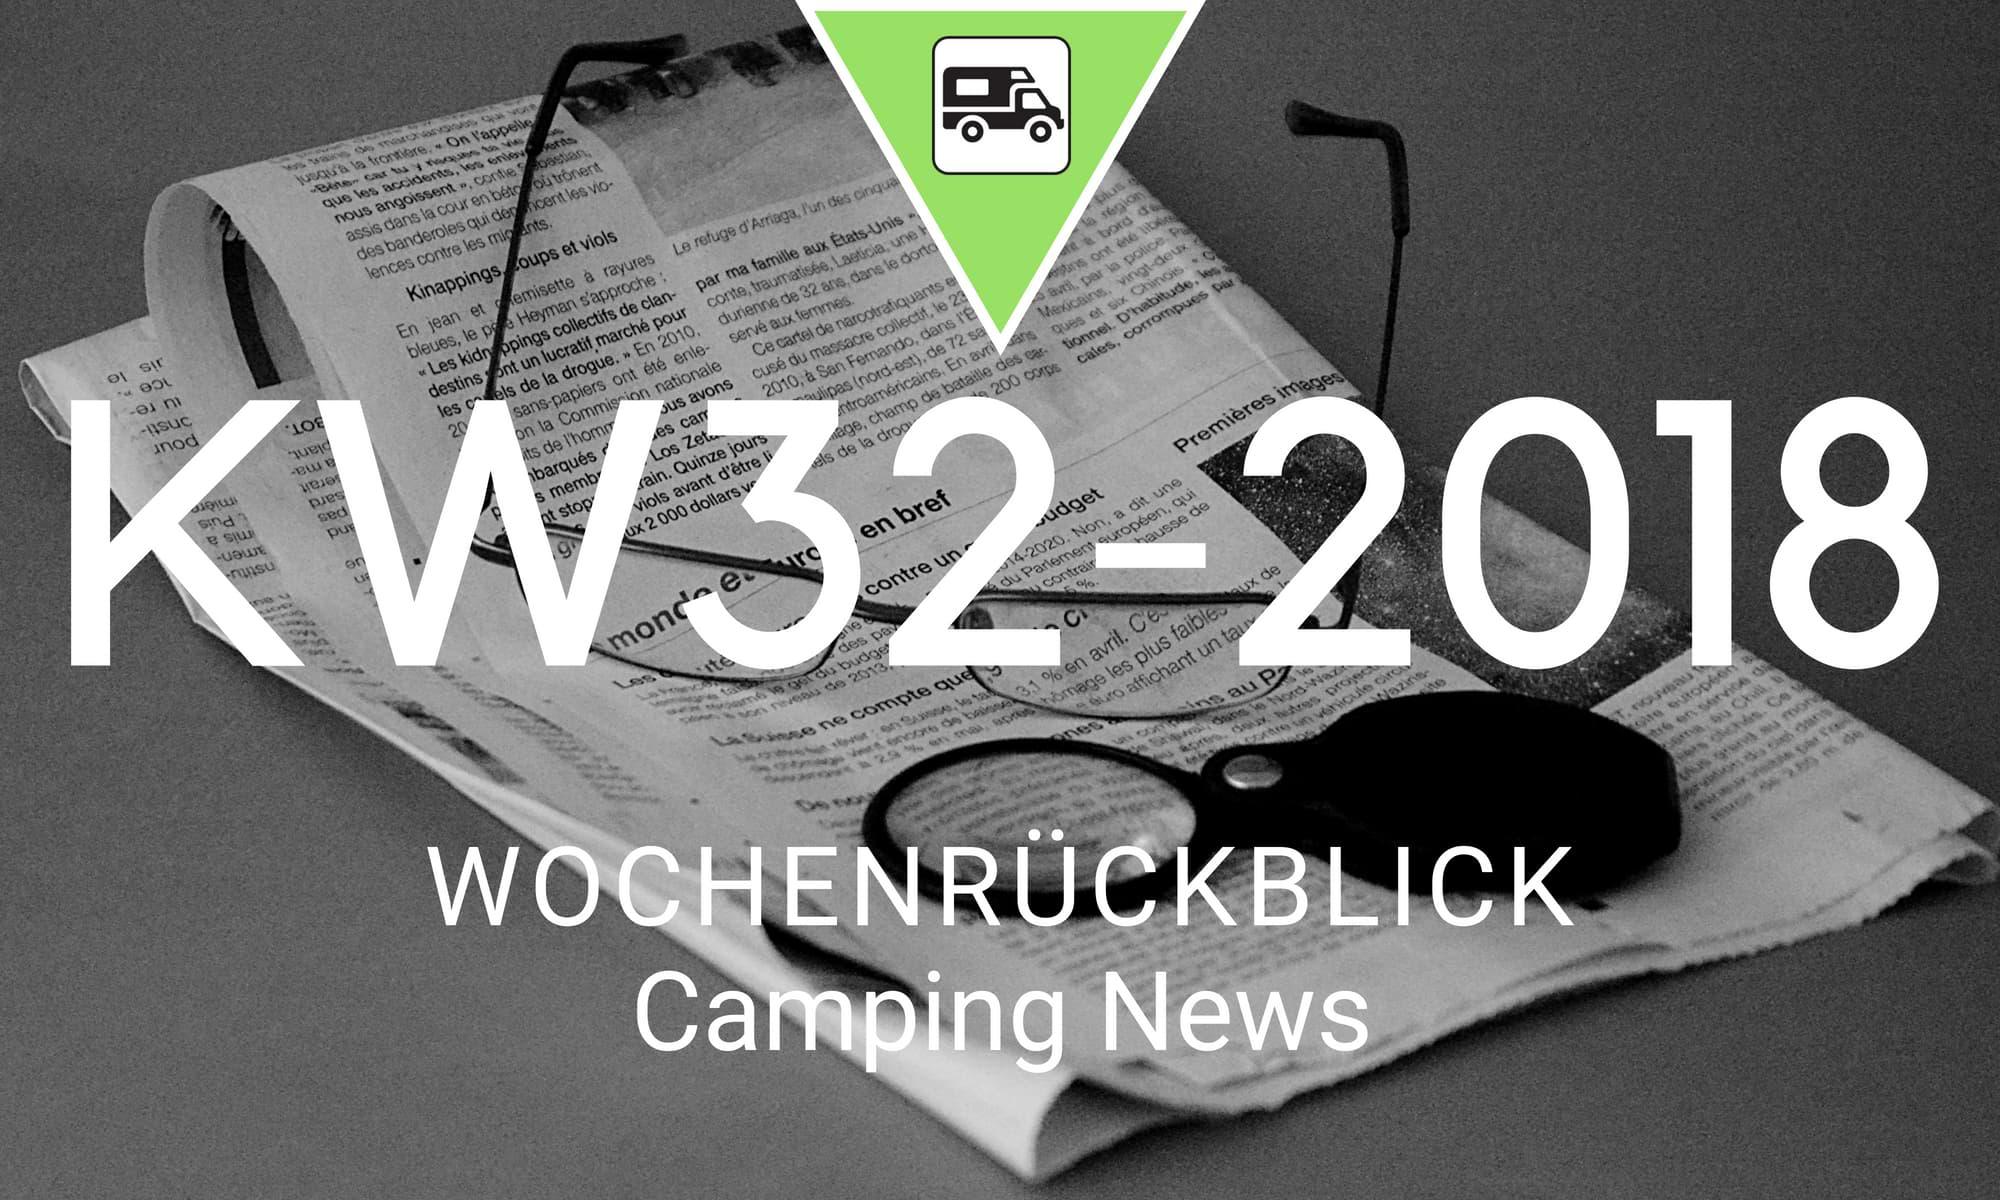 Wochenrückblick Camping News KW32-2018